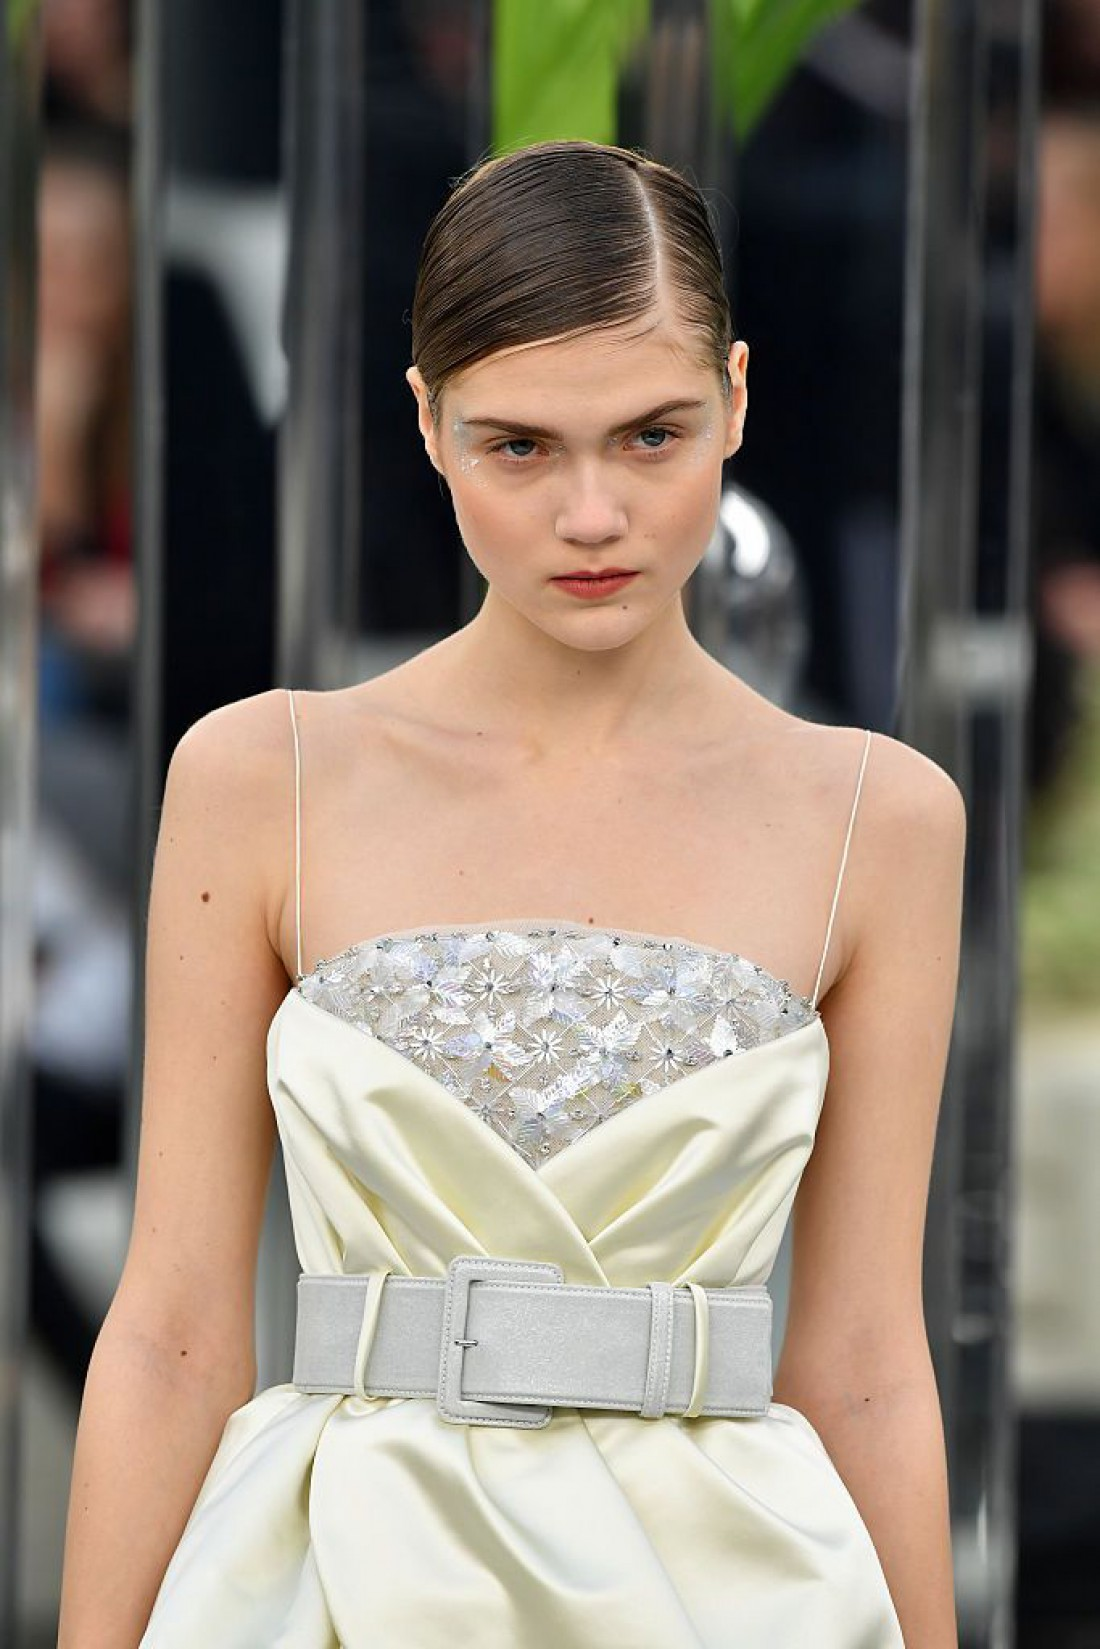 Украинская модель Елизавета Пенцарская на показе Chanel